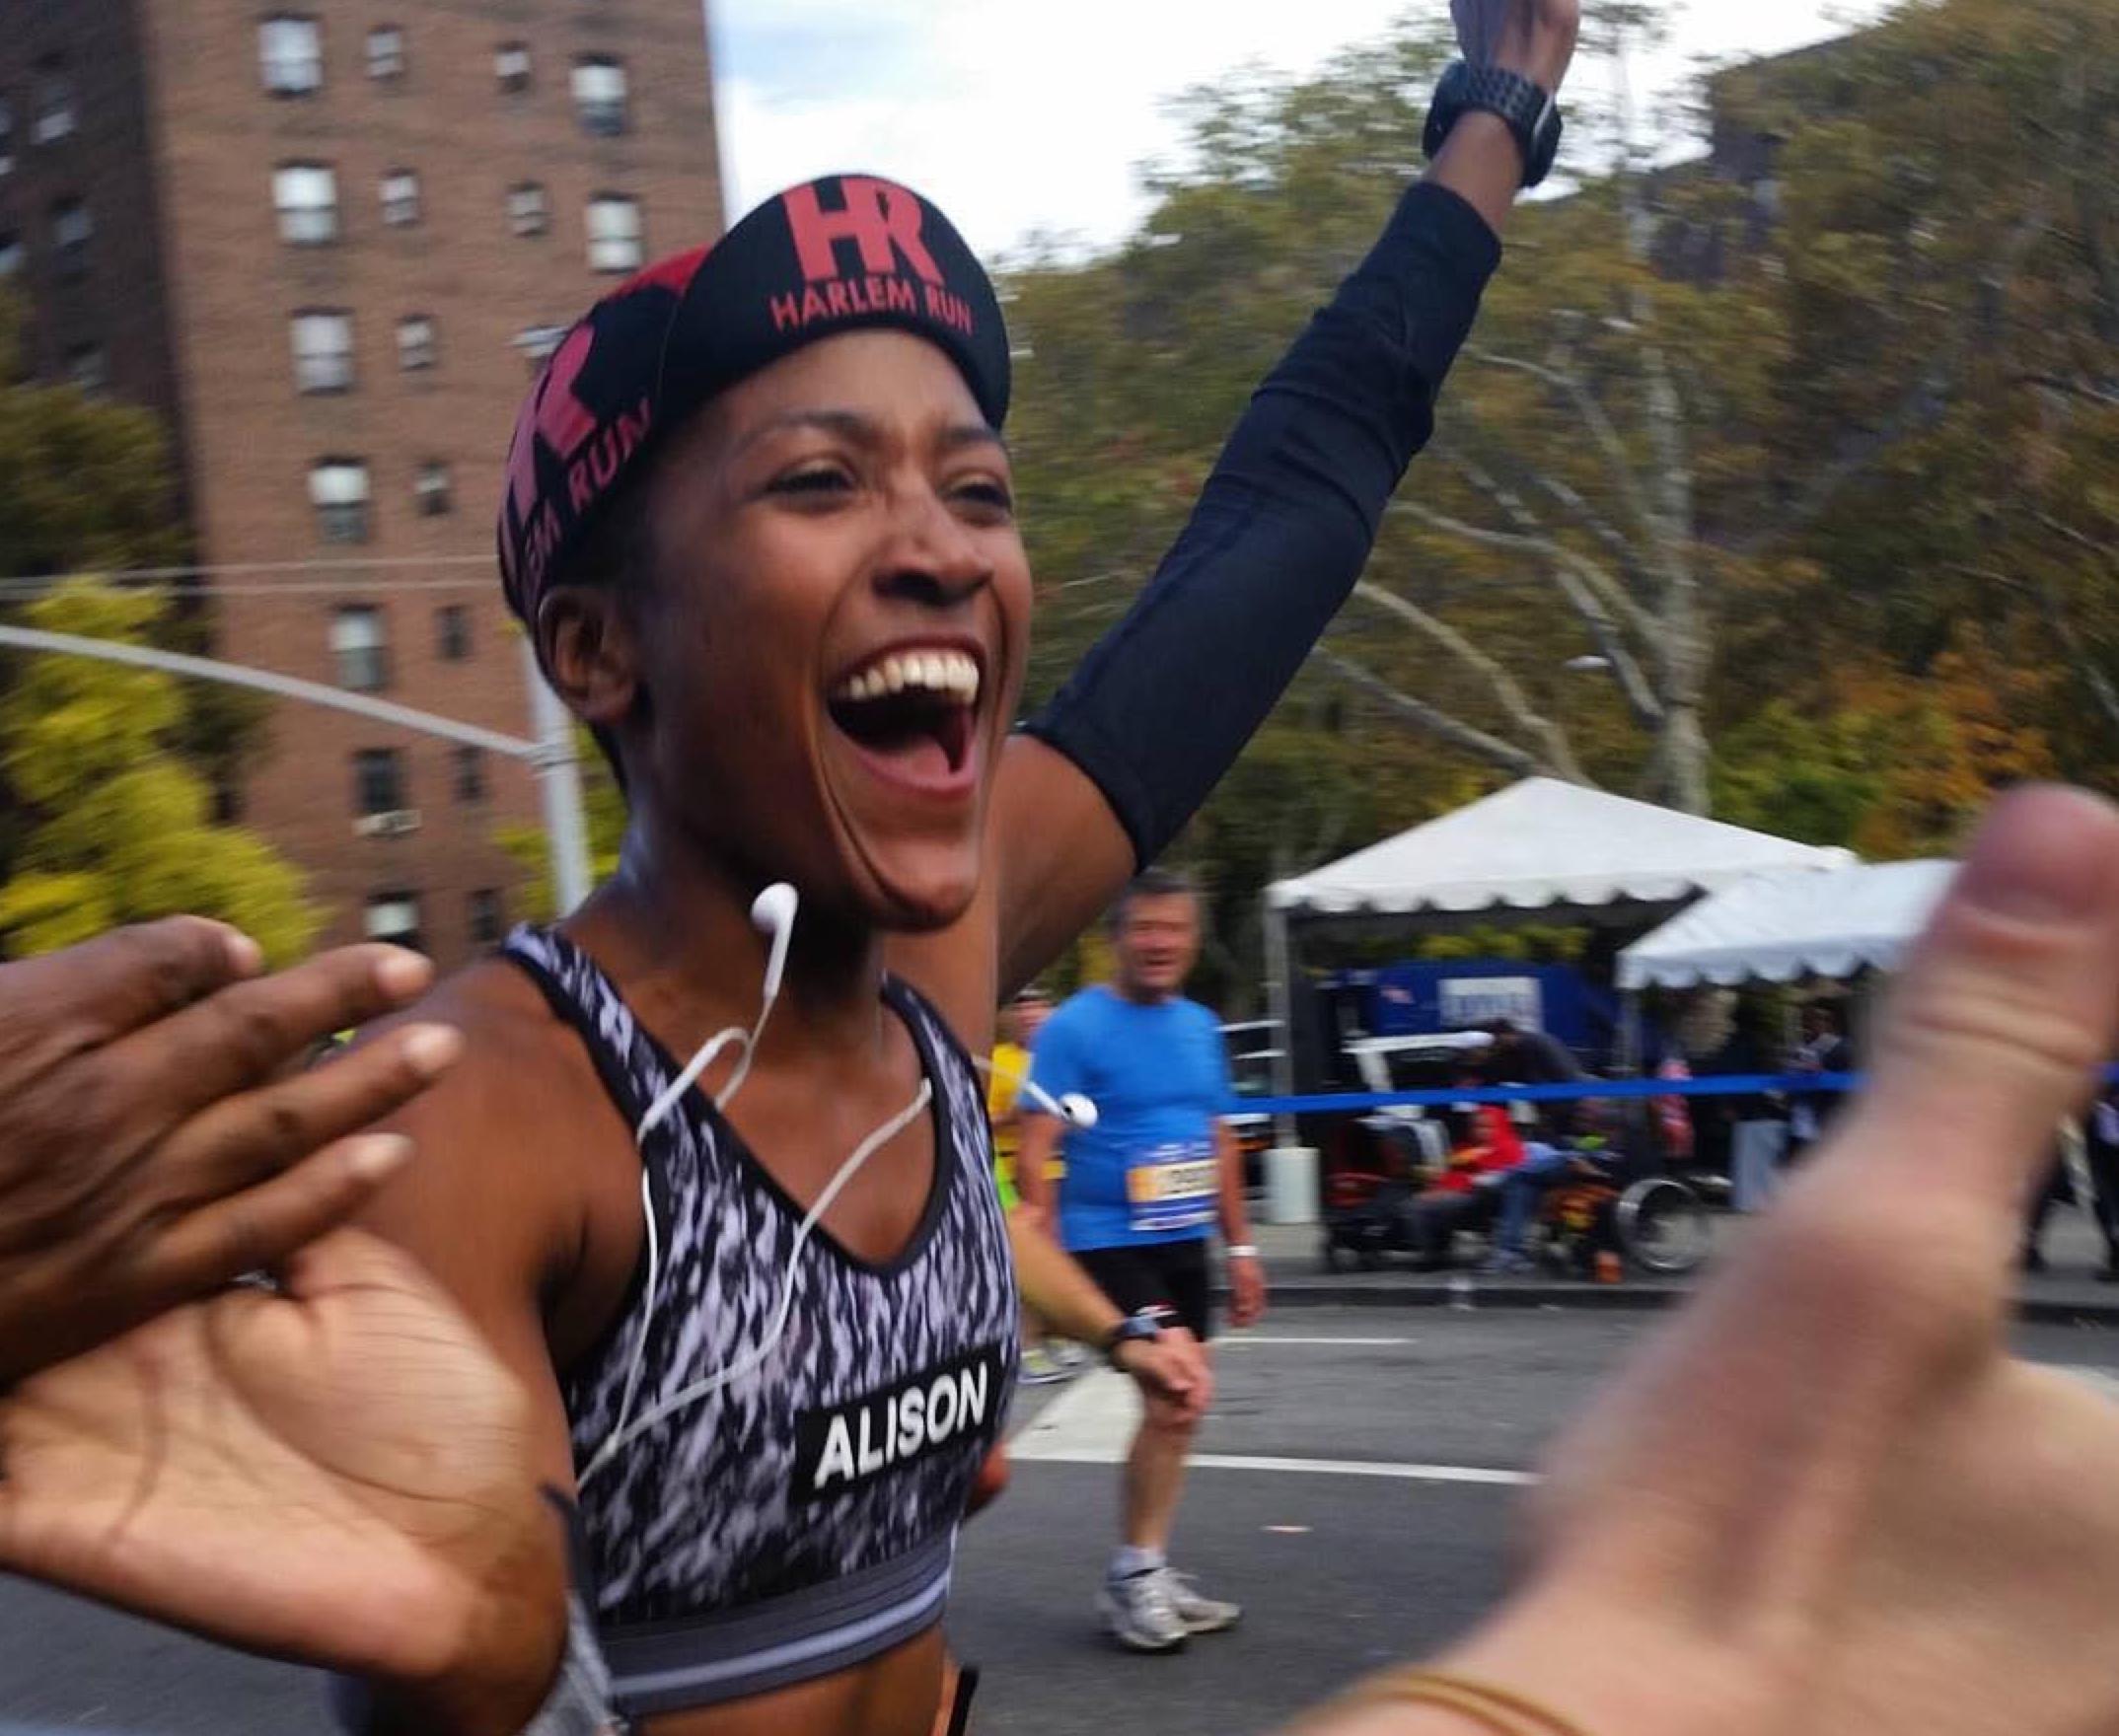 A New York City Marathon runner